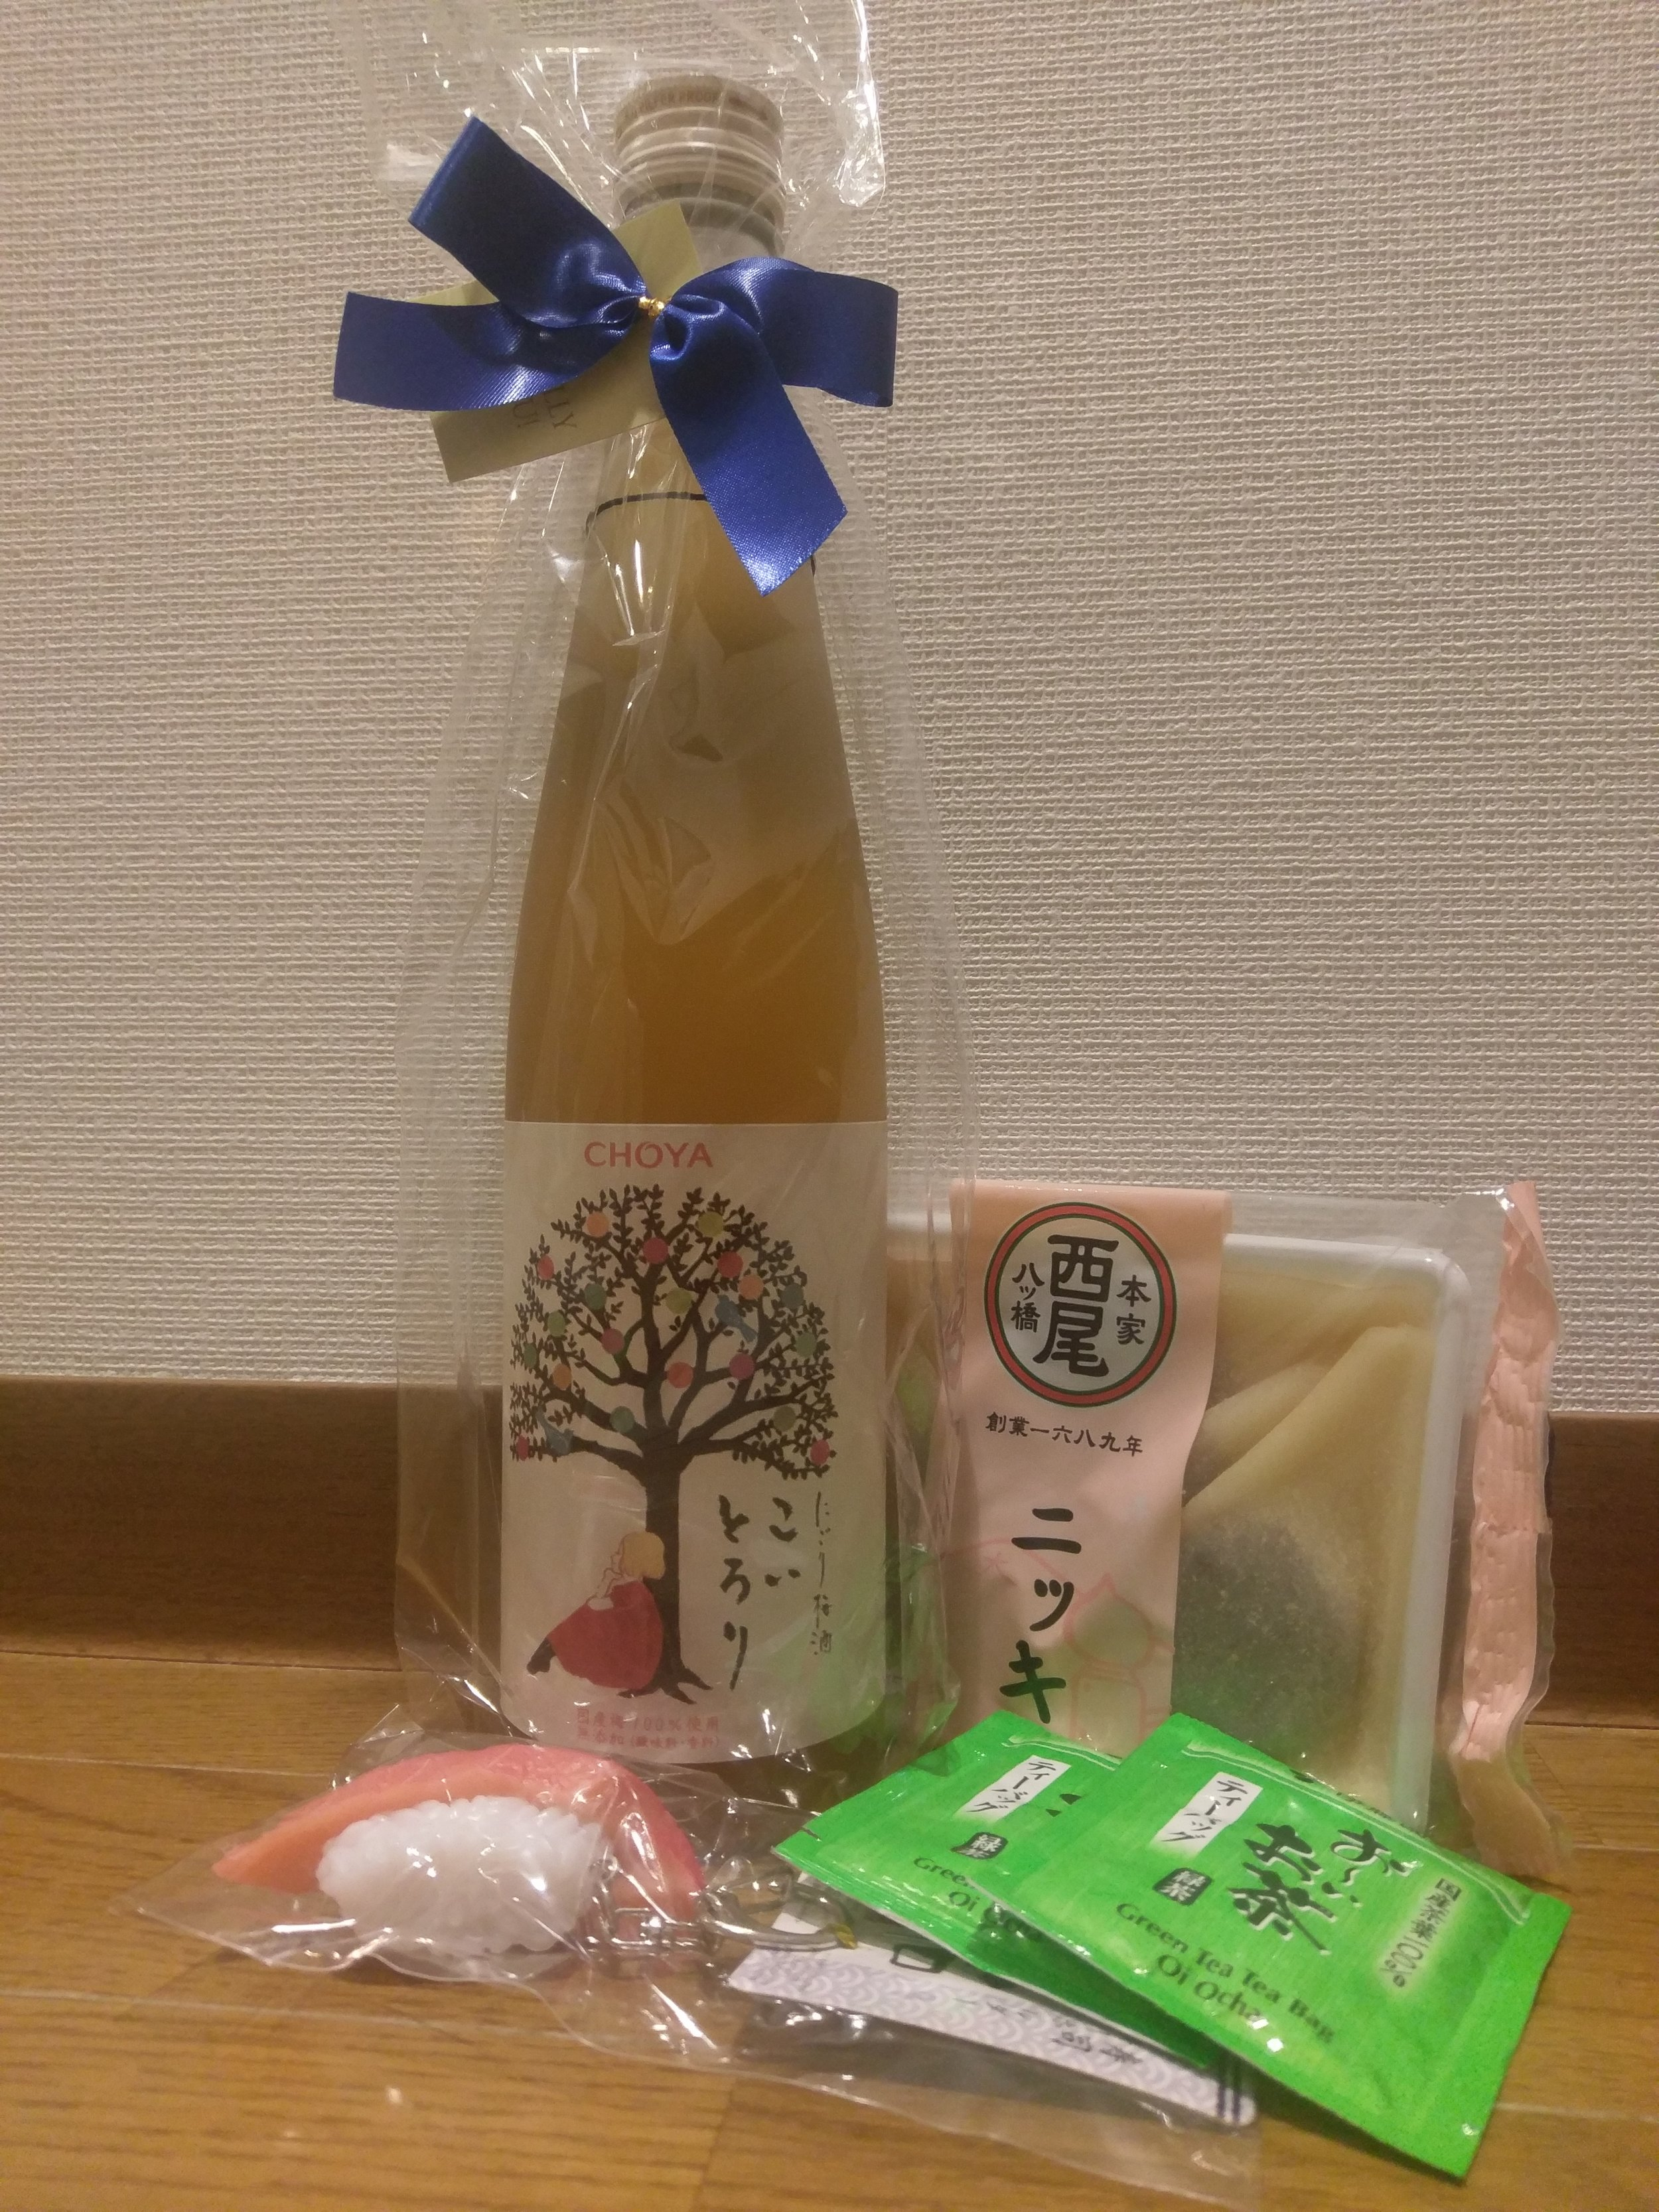 Umeshu  (Liquor Mountain), cinnamon  yatsuhashi  (Honke yatsuhashi Nishio, Gion), green tea bags (supermarket), a sushi key-chain (Daiso)